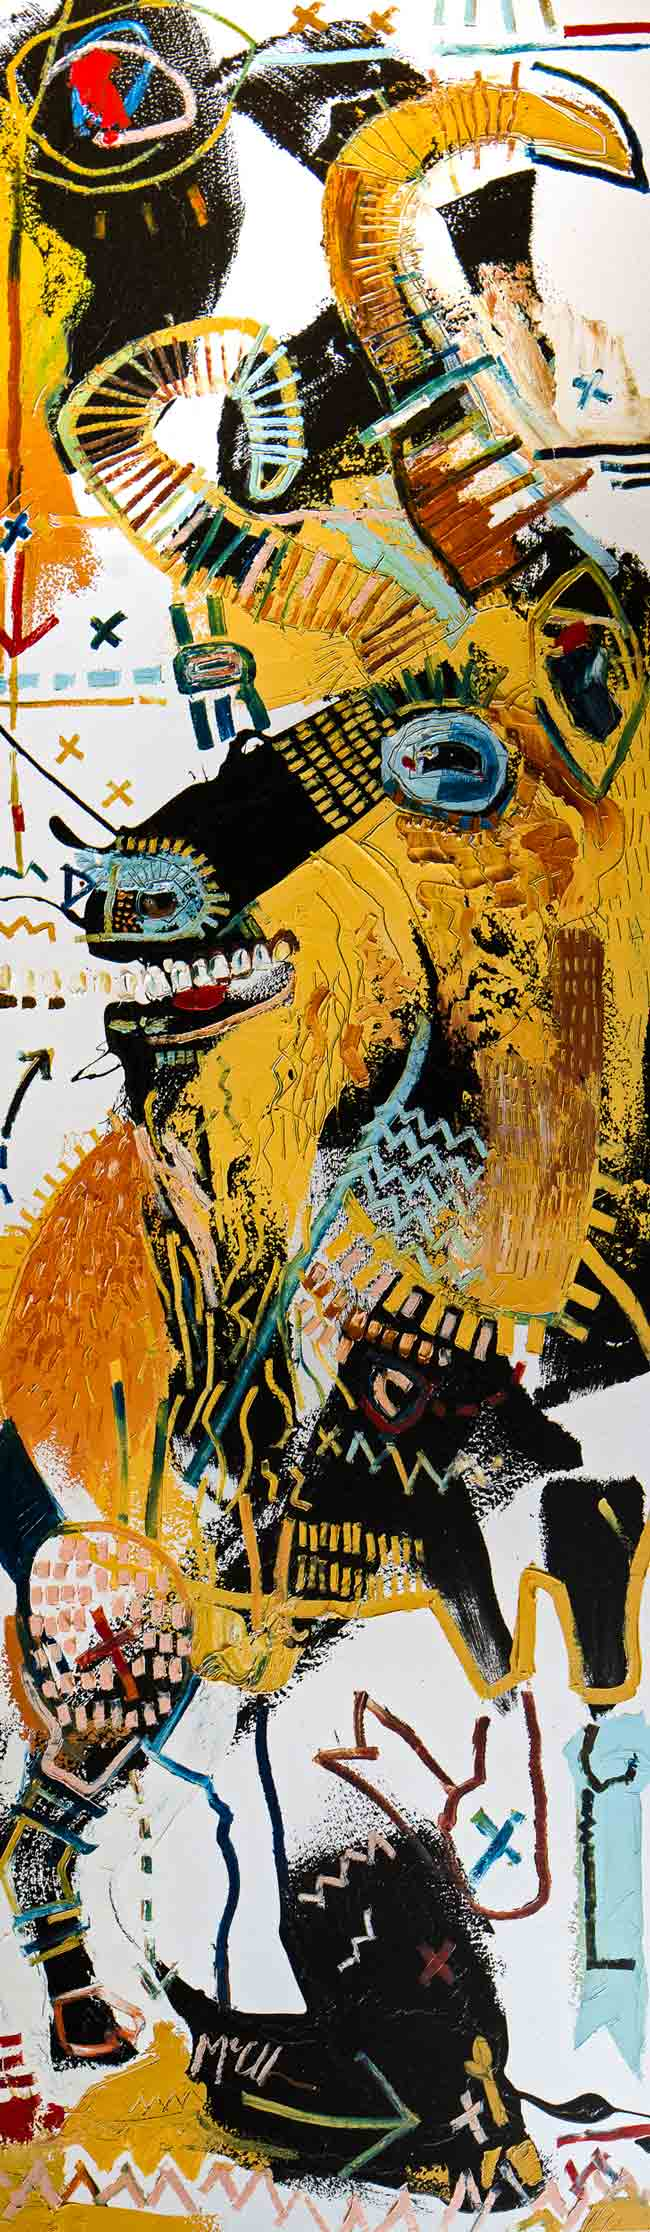 goat mcclendon asheville art